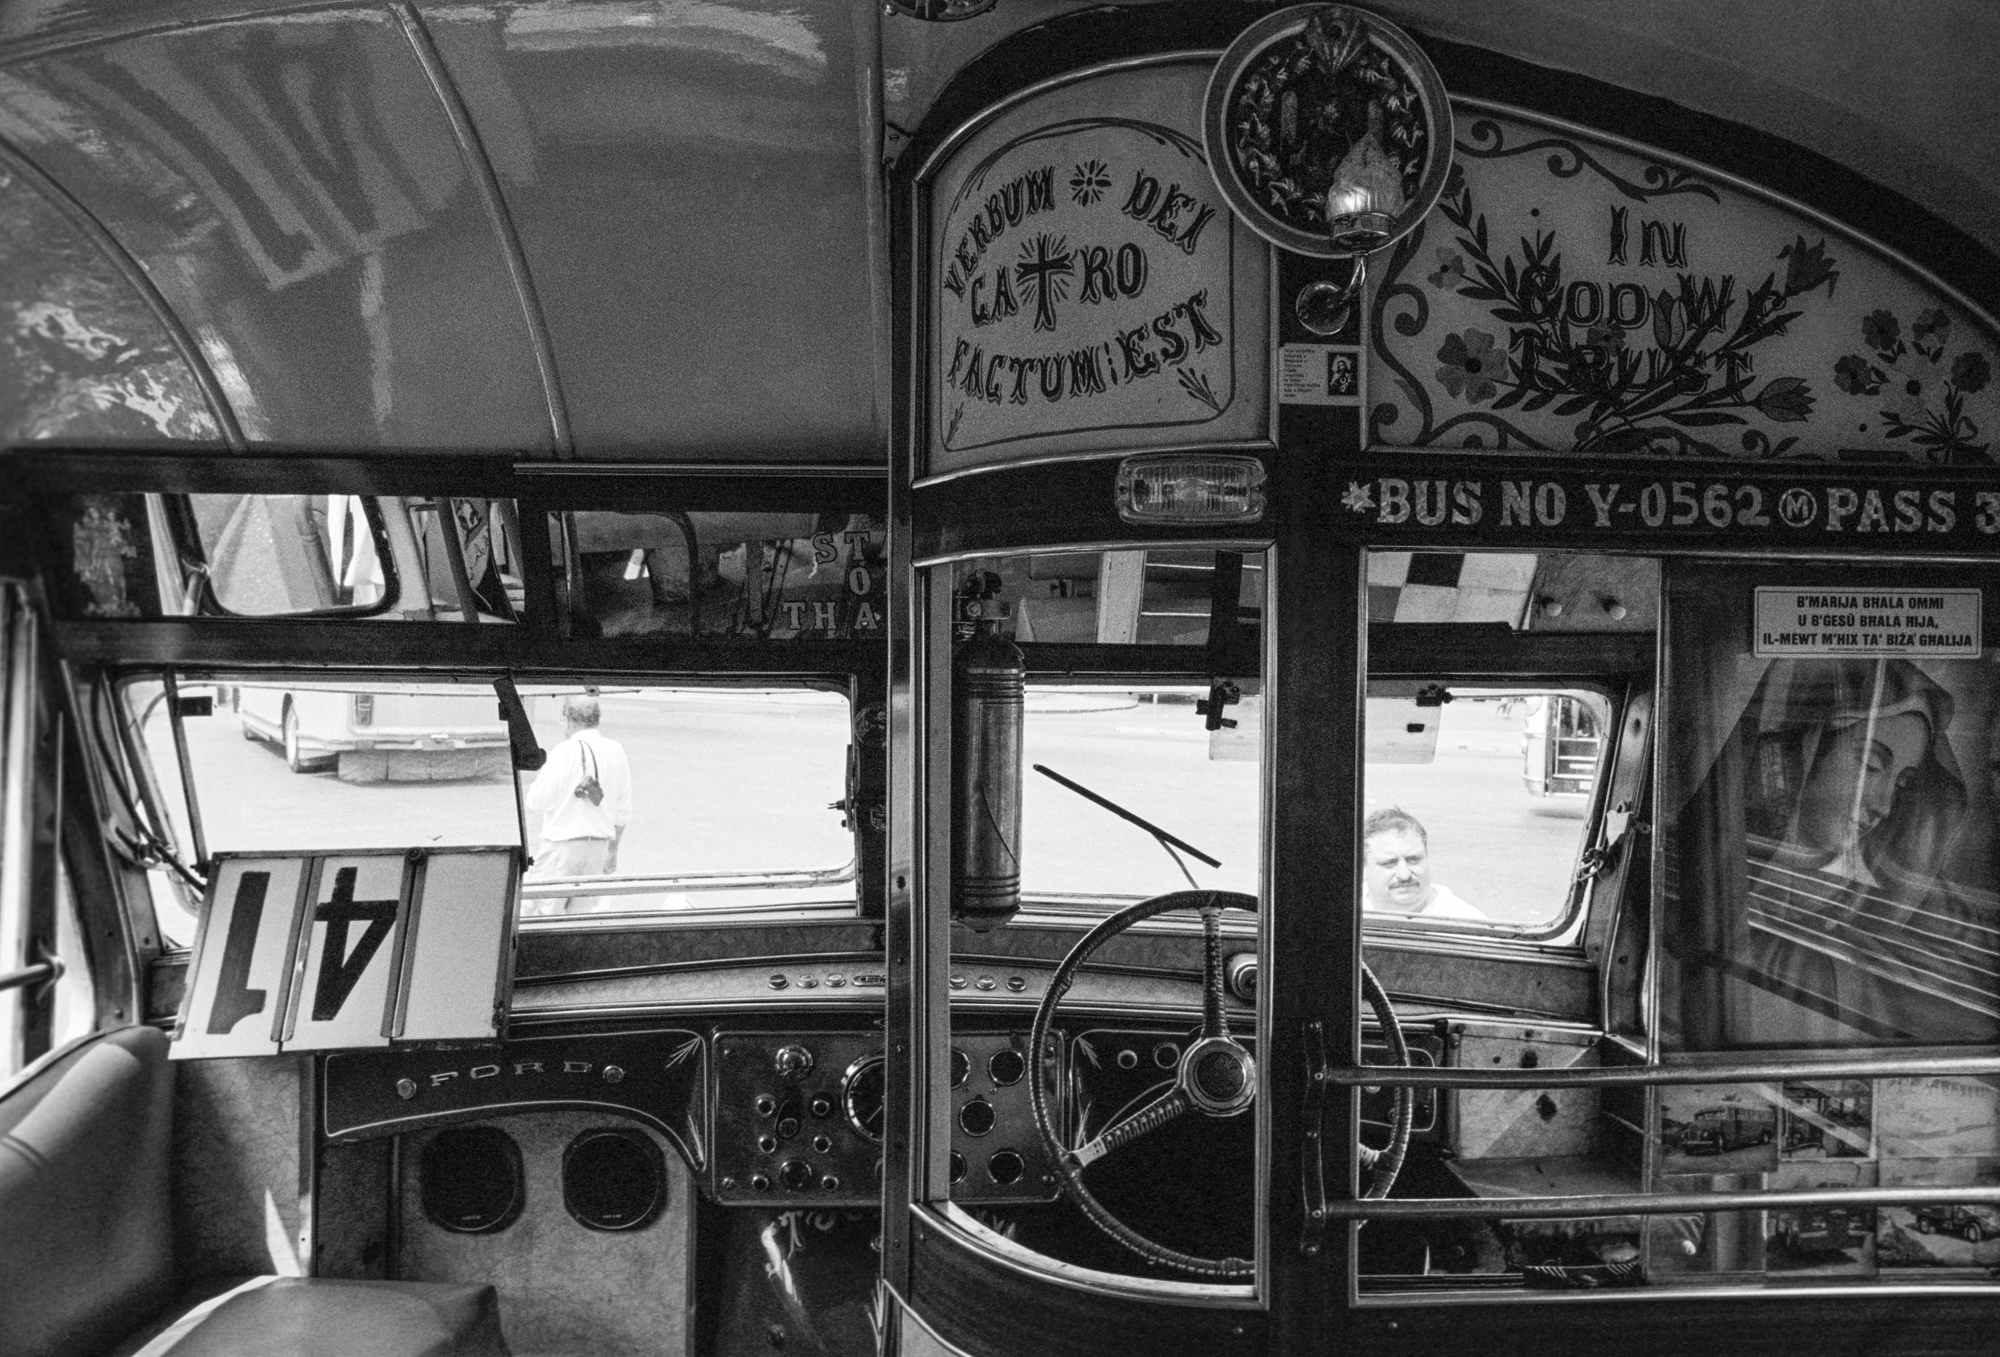 #41 bus.jpg